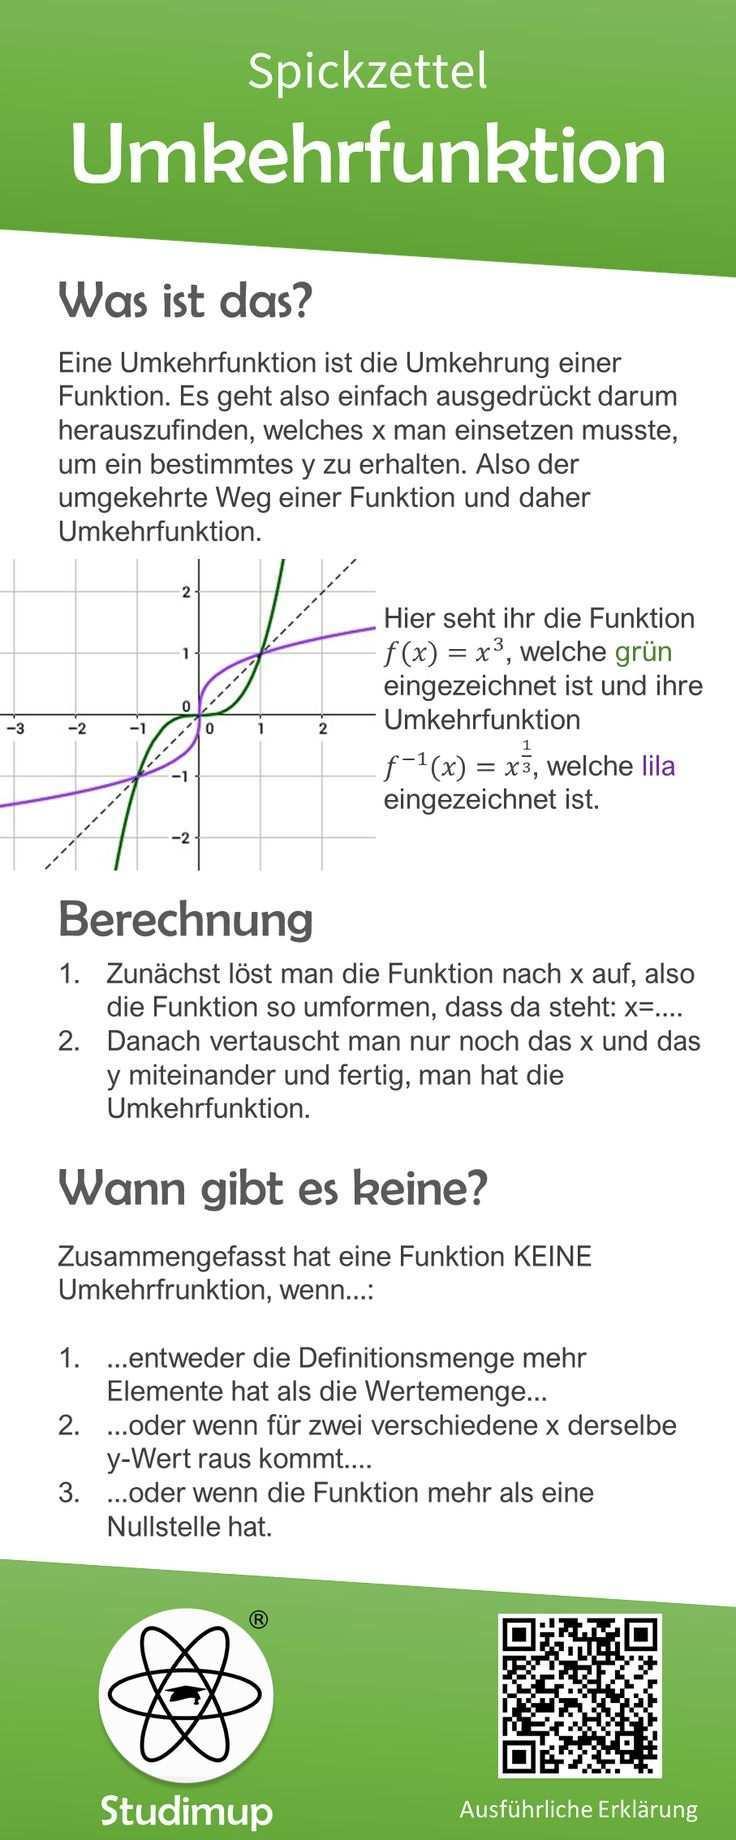 Umkehrfunktion Spickzettel Spickzettel Mathe Formeln Nachhilfe Mathe